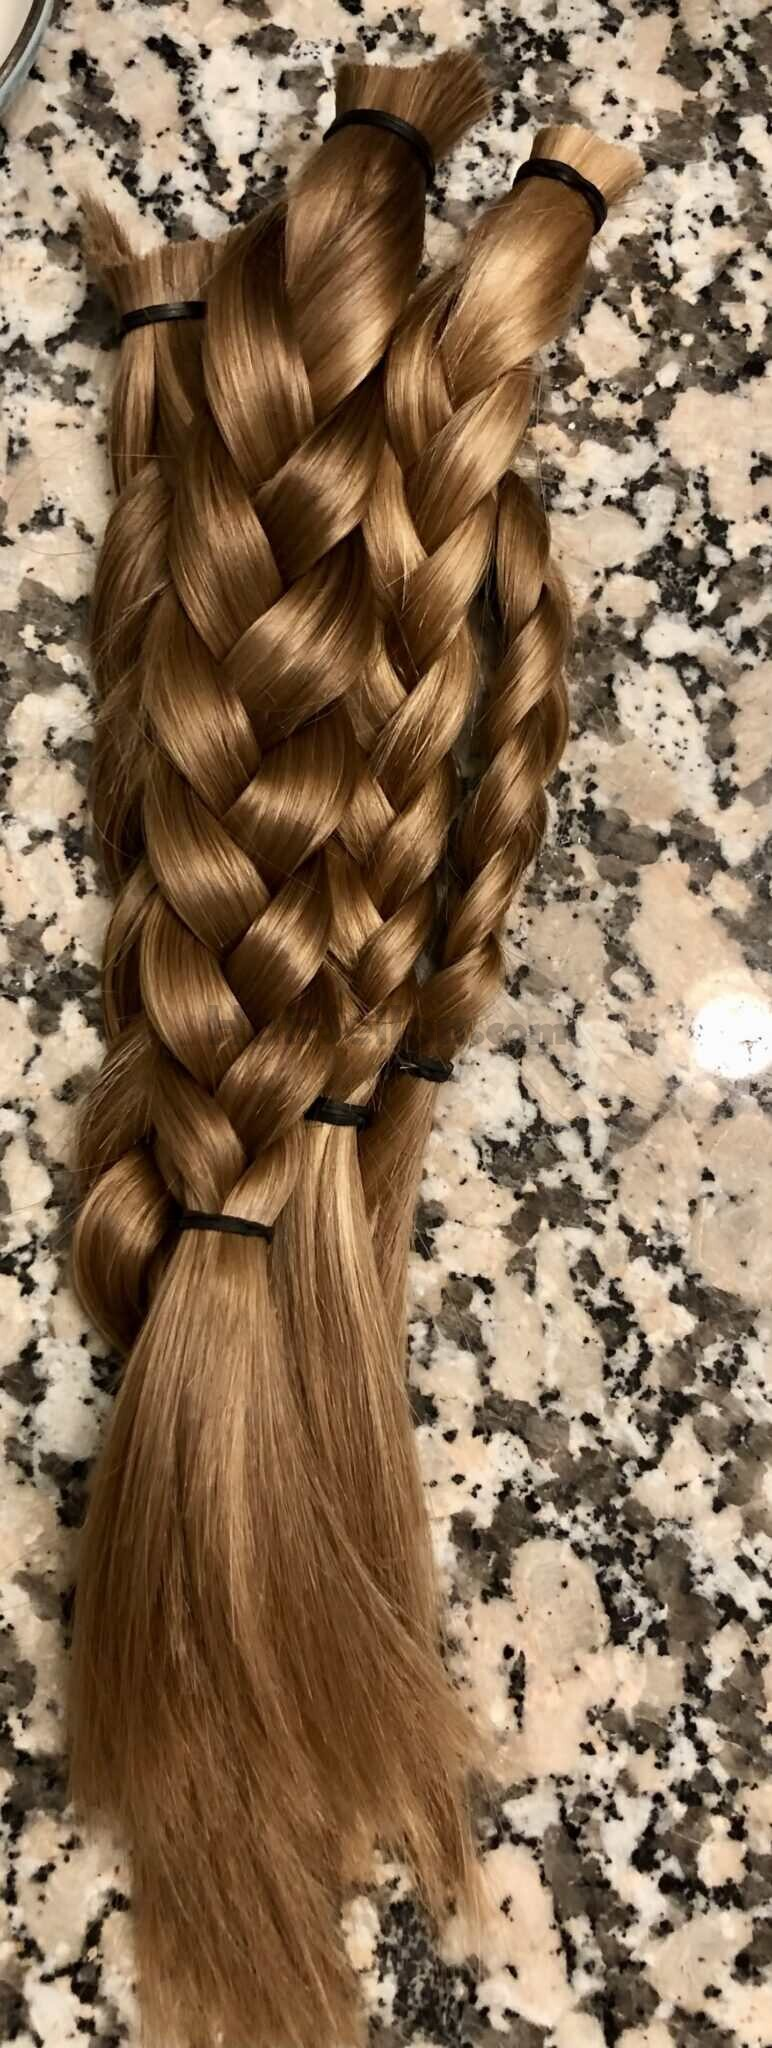 11.5 - 12.5 inches of dark blond virgin female hair.